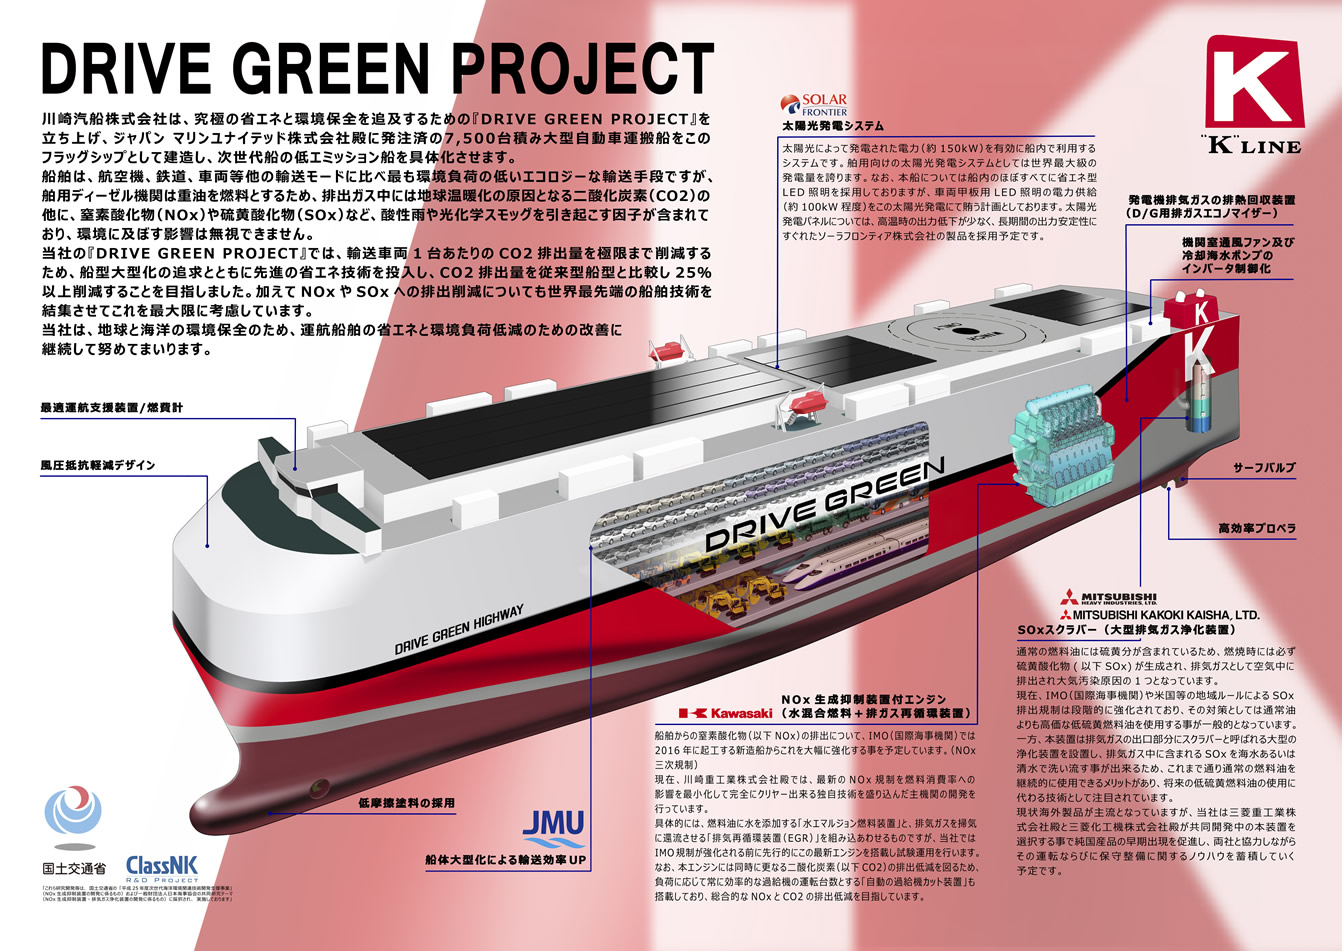 DRIVE GREEN PROJECT | 川崎汽船...